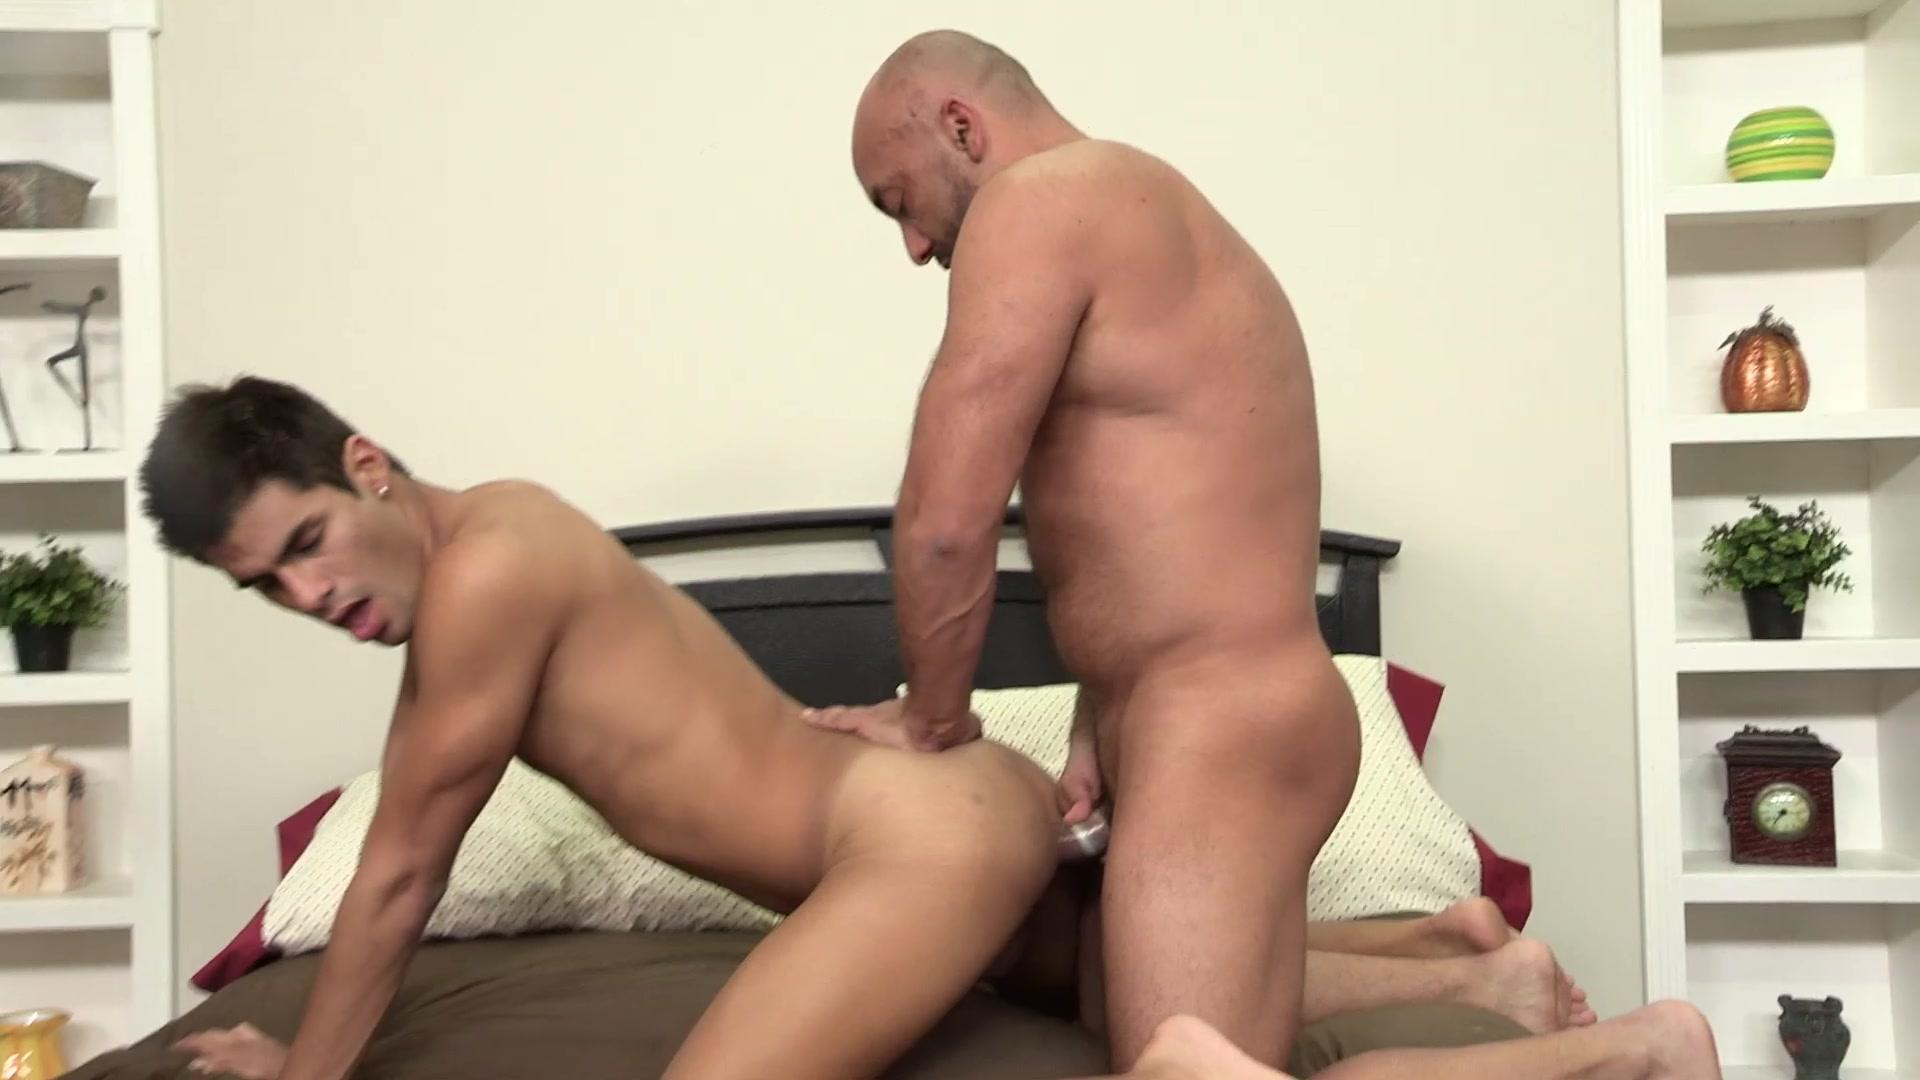 free hard moaning gay sex videos